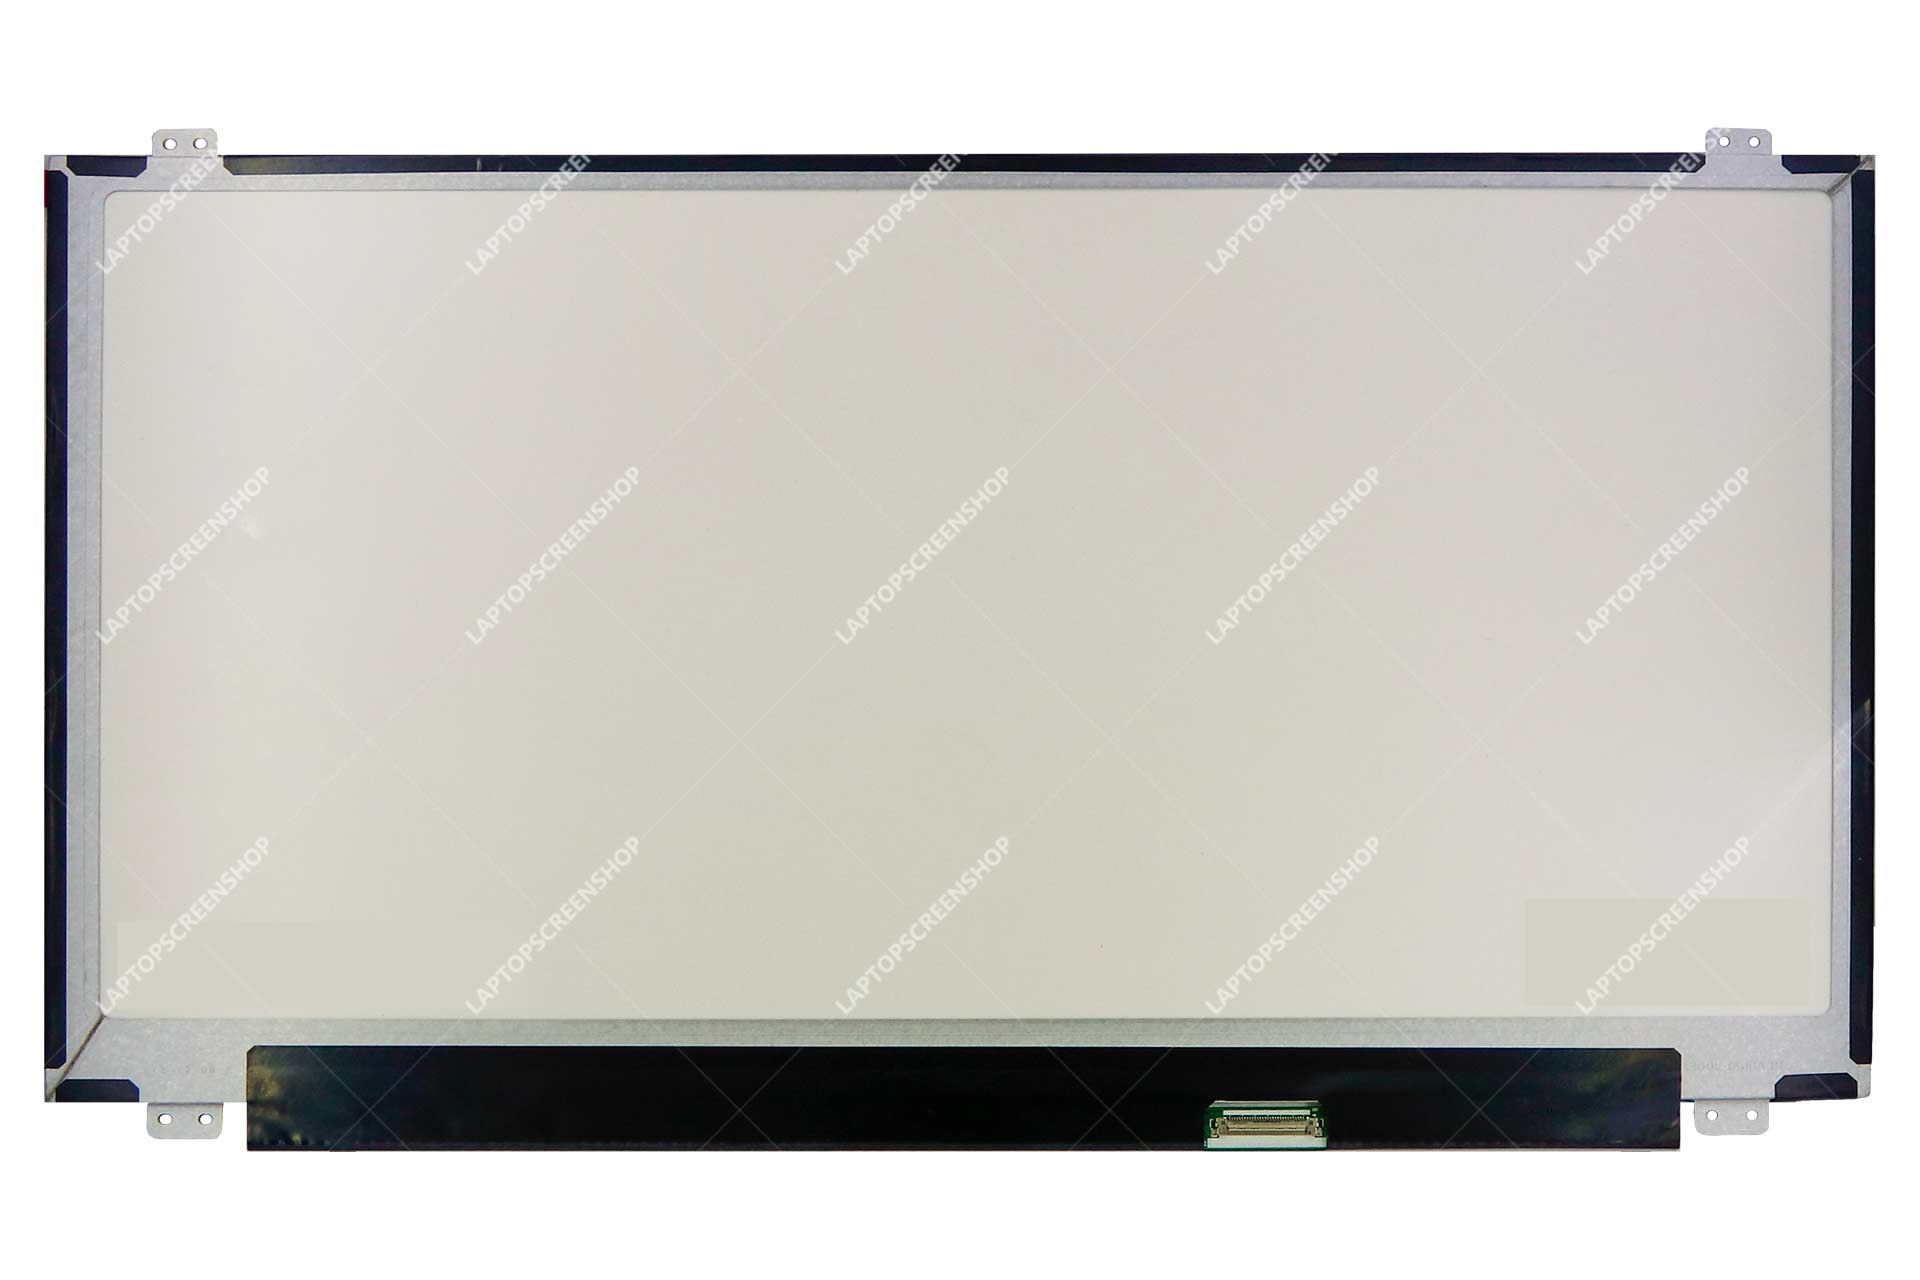 ACER-ASPIRE-E1-510-2602-LCD |HD|فروشگاه لپ تاپ اسکرين | تعمير لپ تاپ